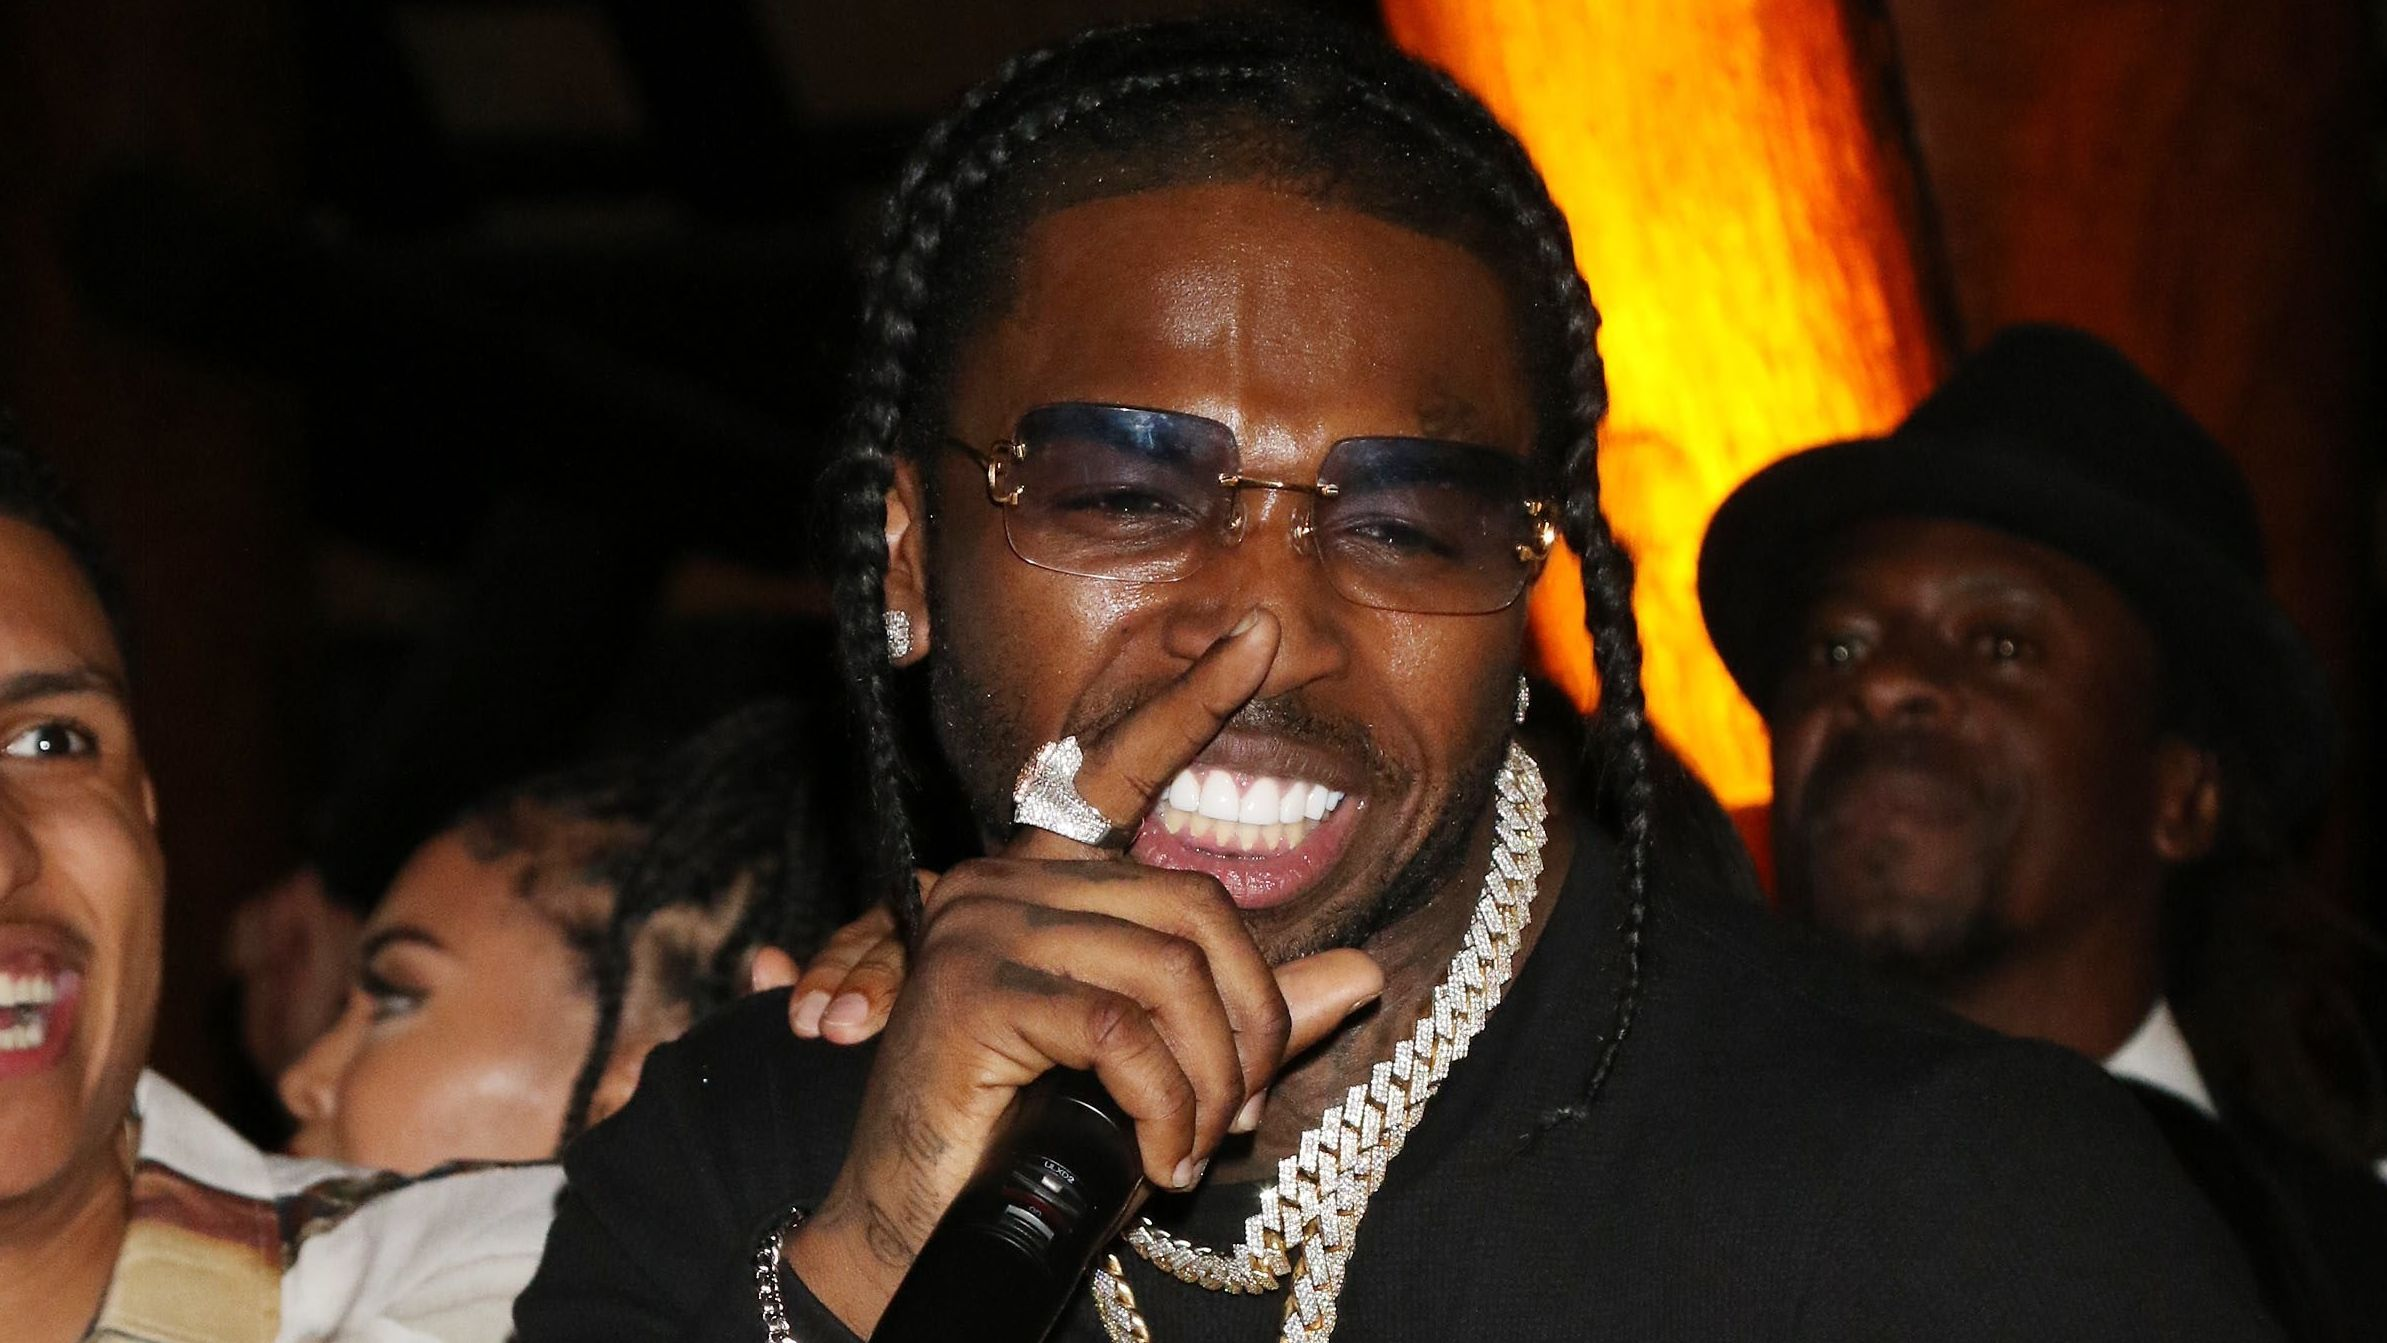 Rapper Pop Smoke